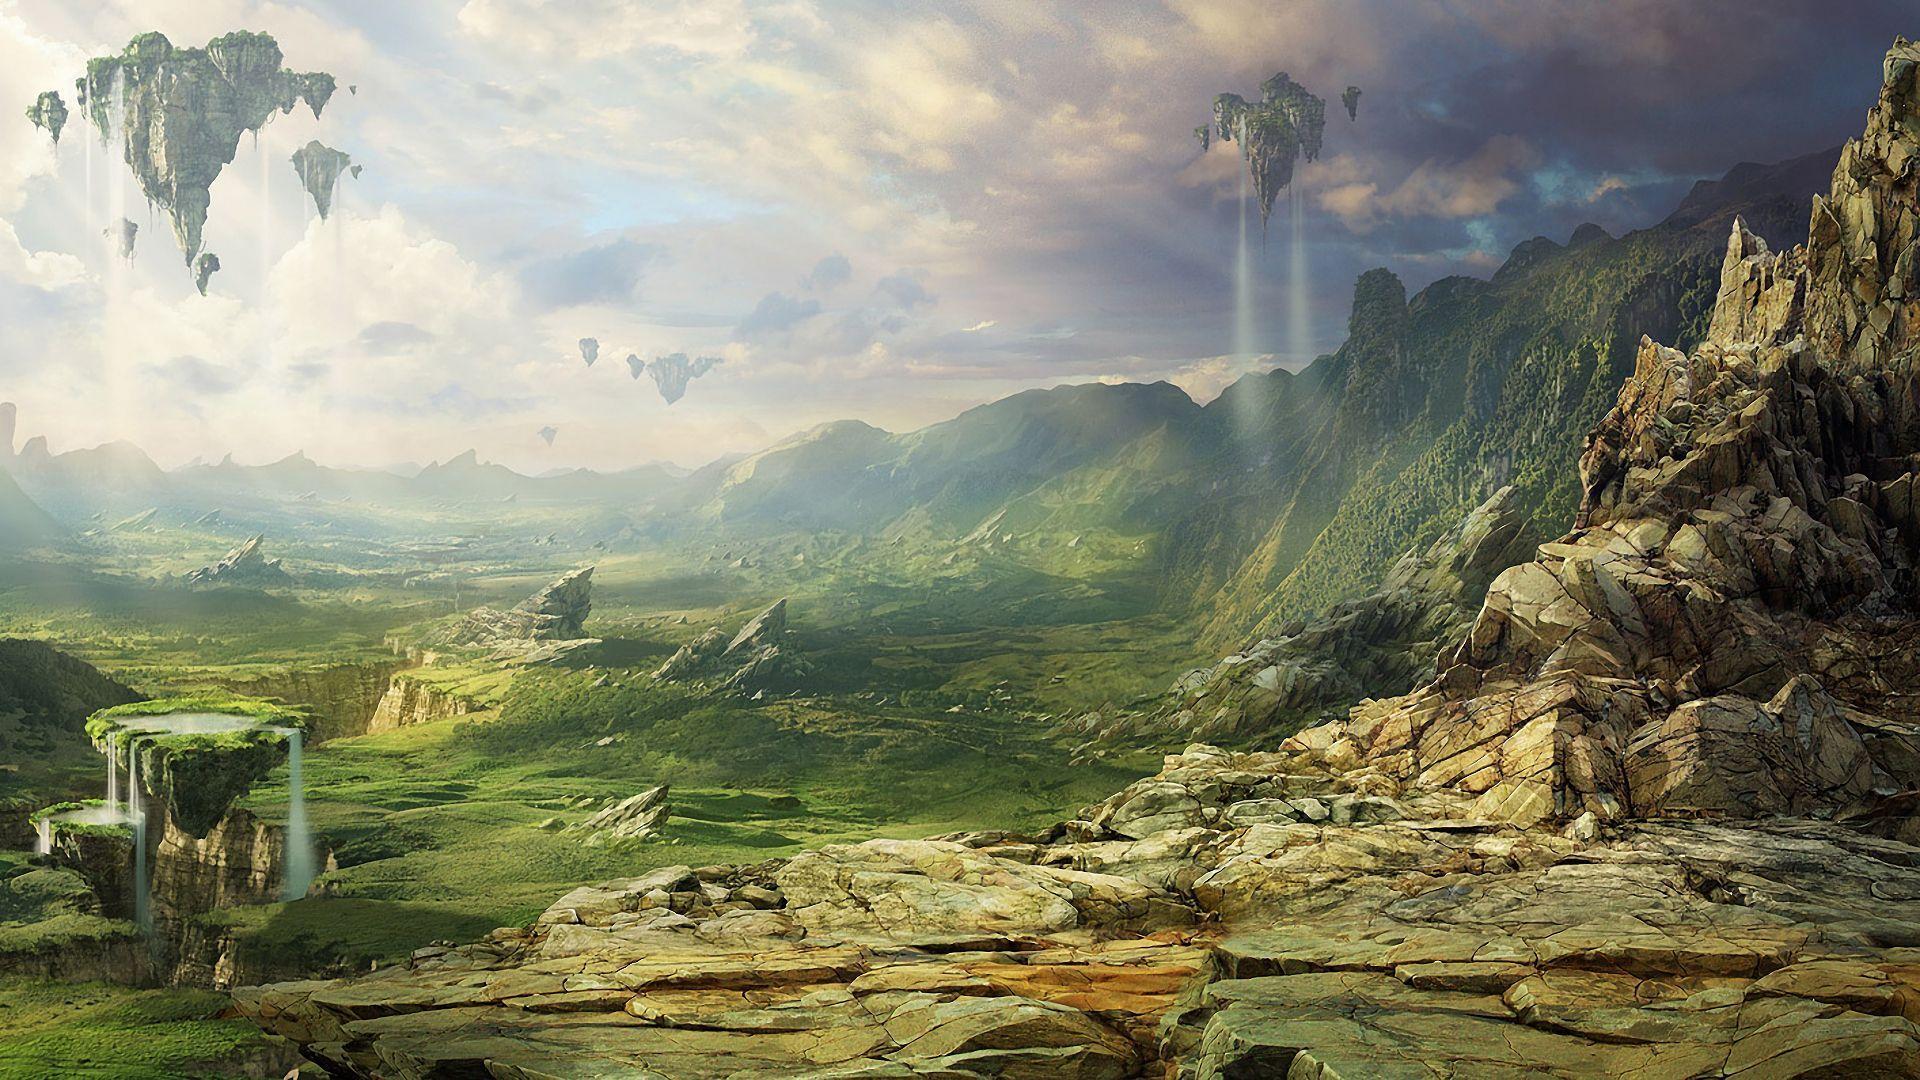 1920x1200 Sci Fi Landscape Wallpapers 19